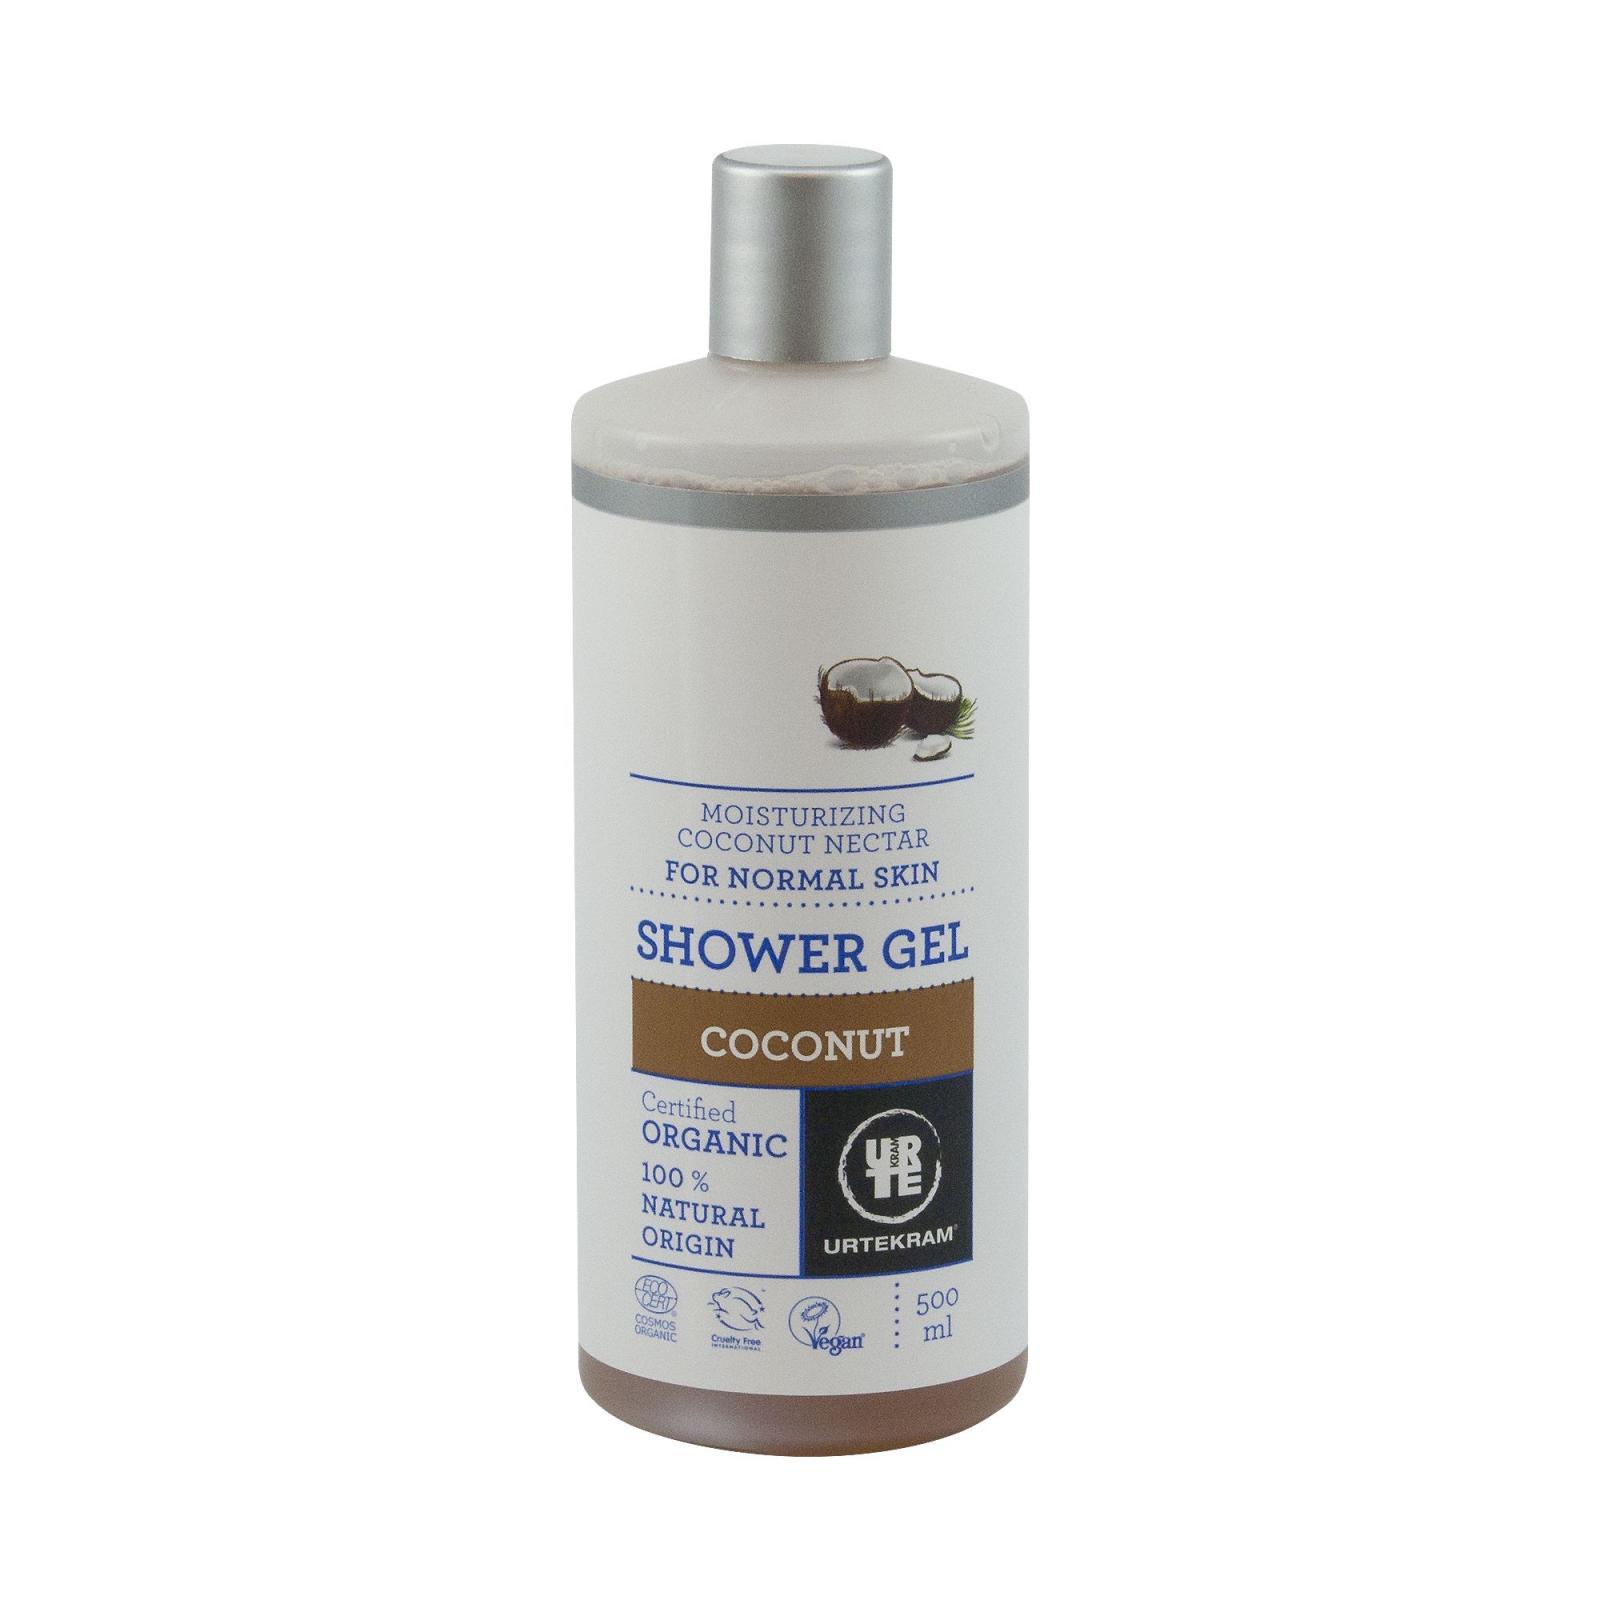 URTEKRAM, Hydratační sprchový gel s kokosovým nektarem 500 ml BIO, VEG